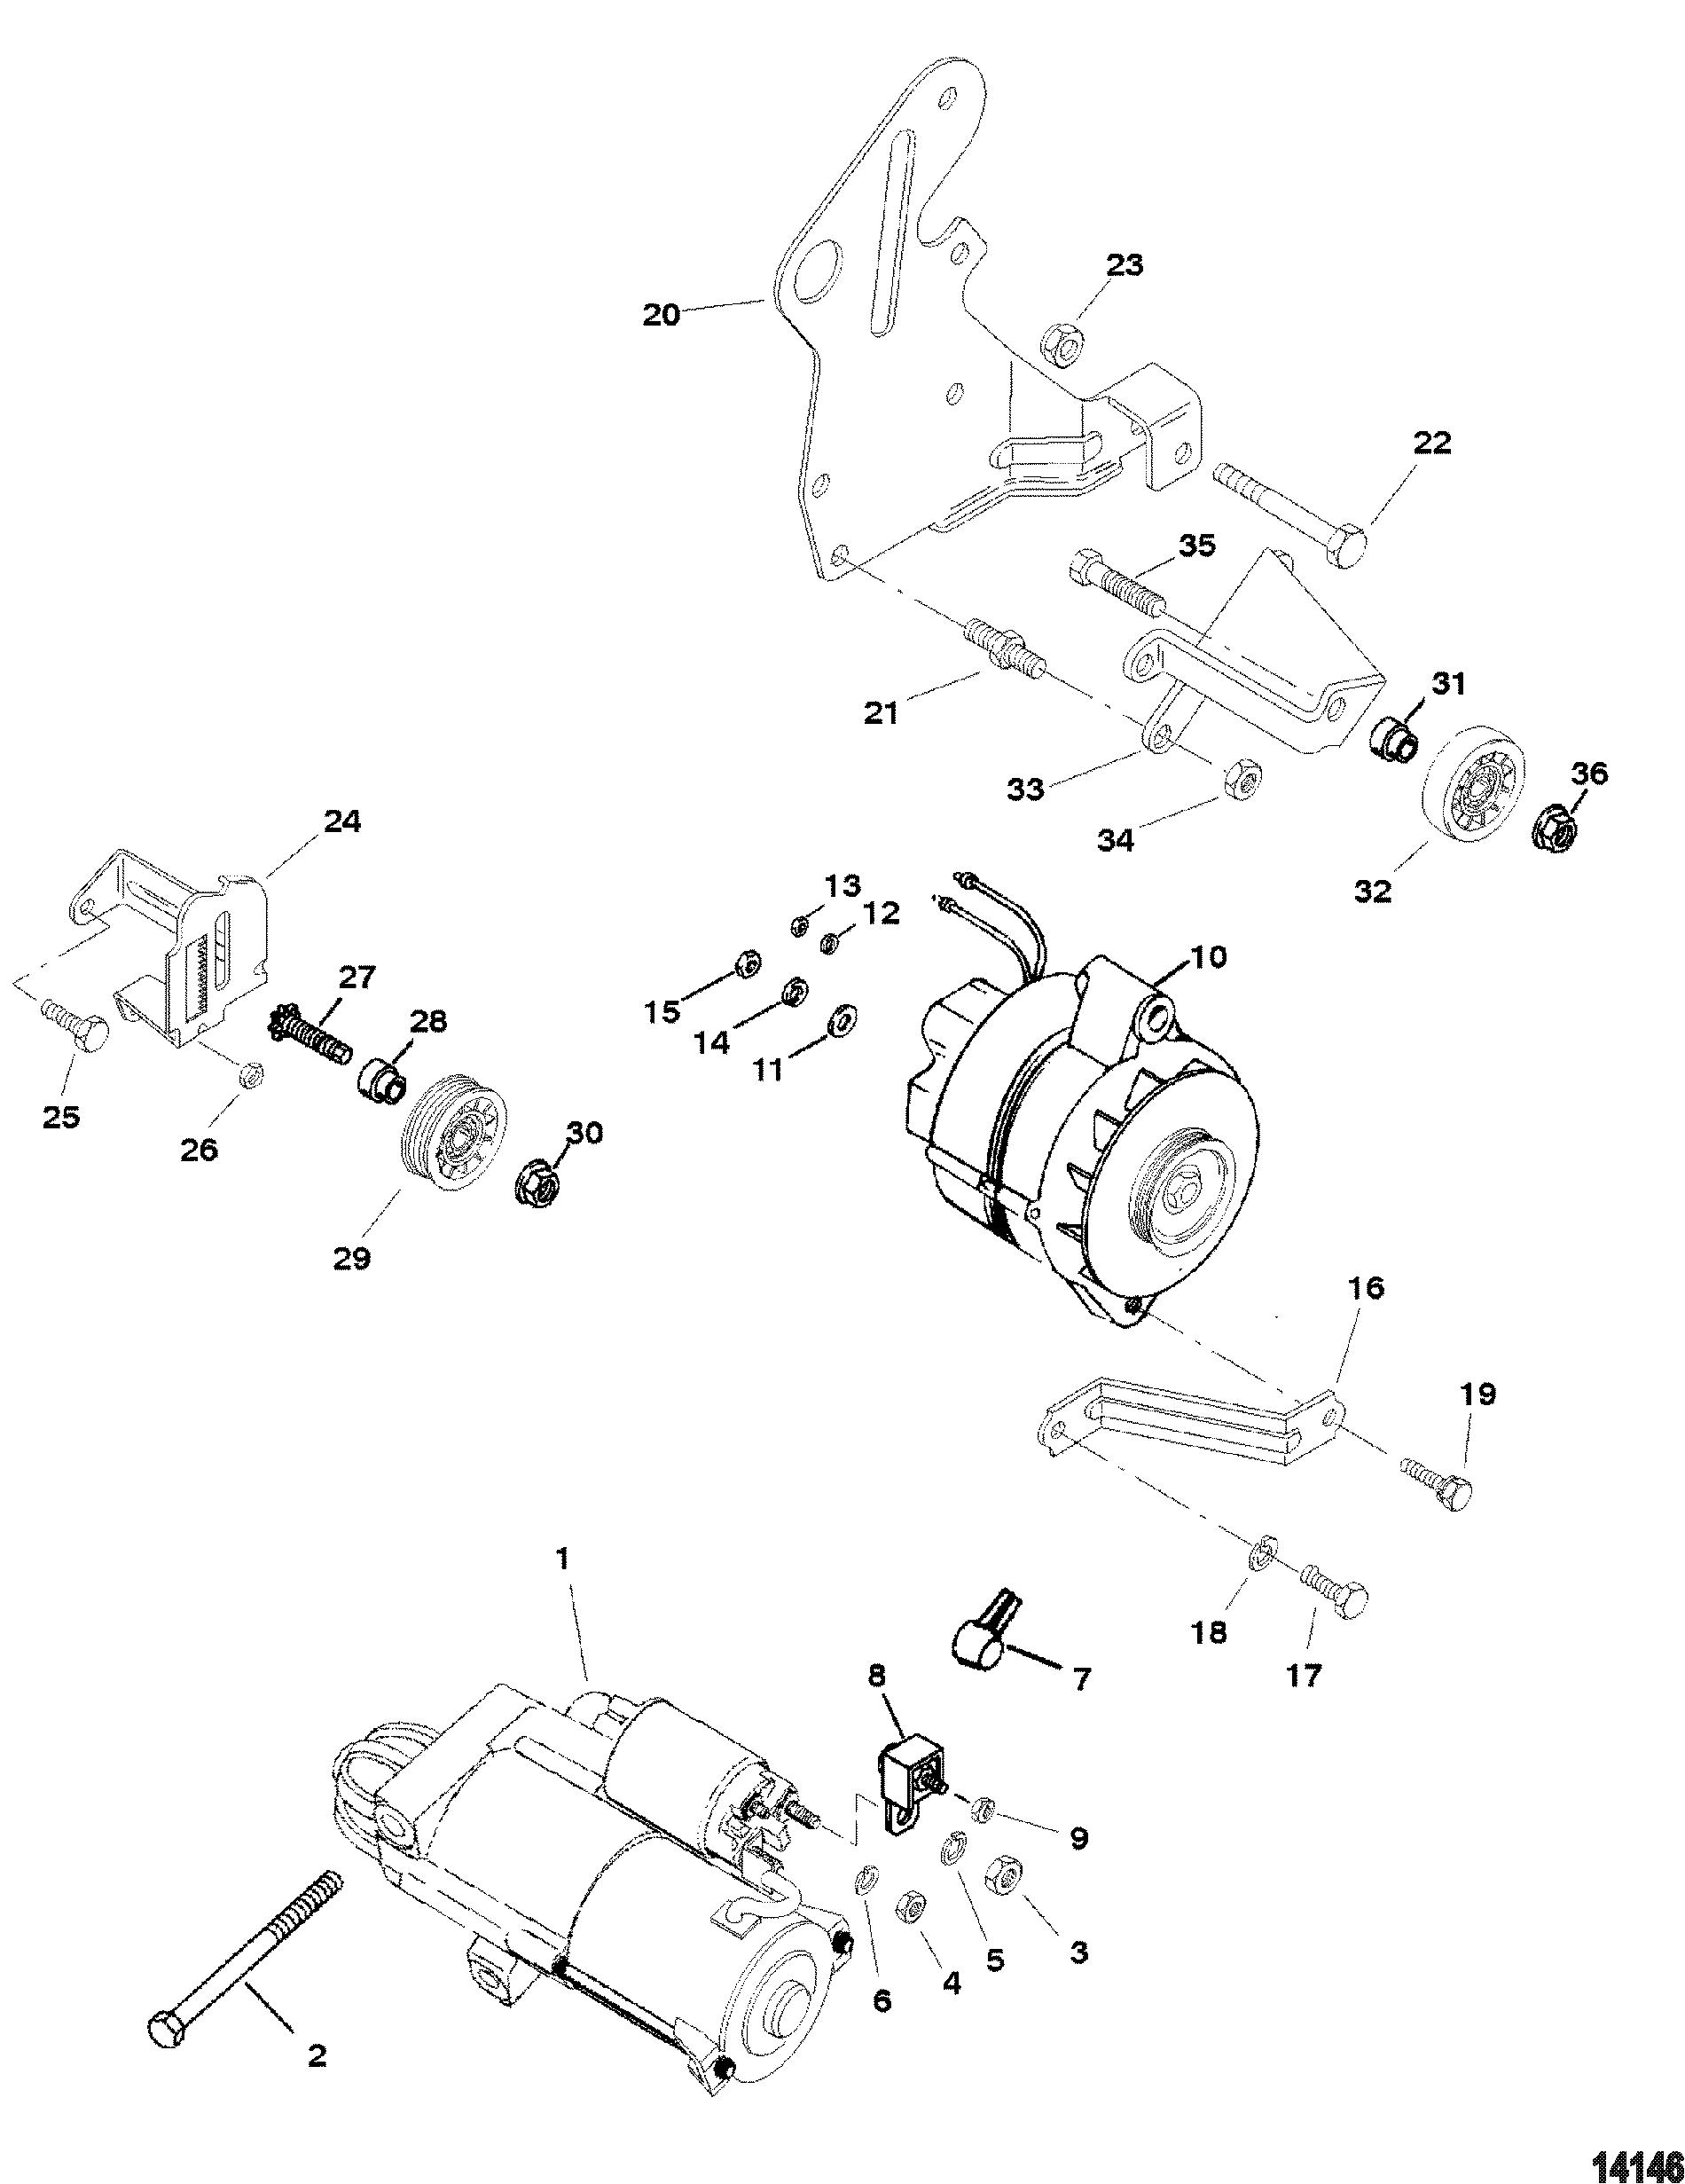 indmar alternator wiring diagram indmar 5 7 engine wiring